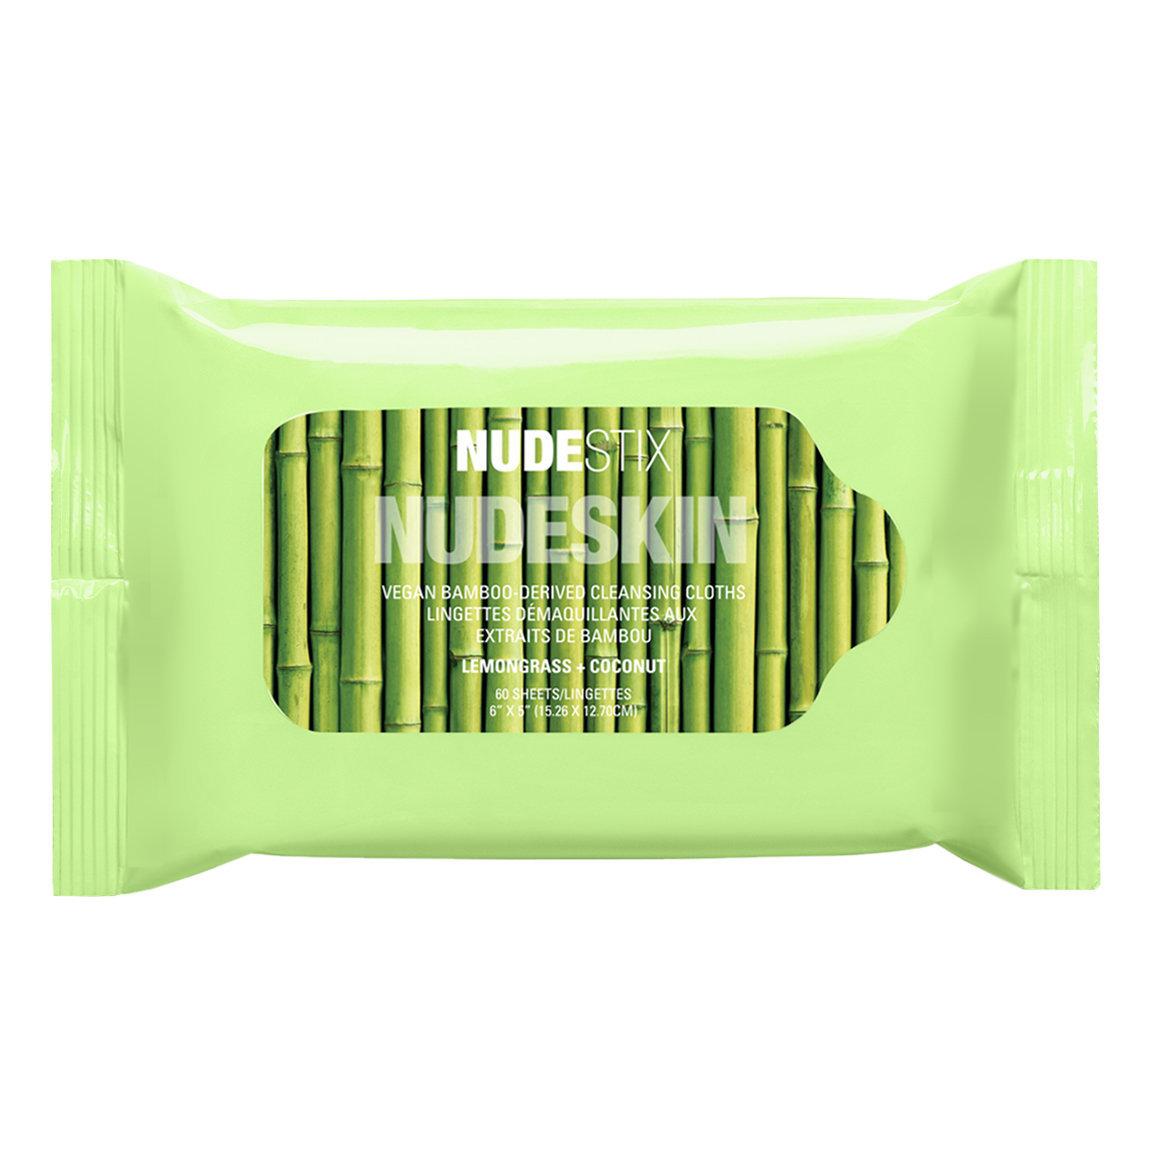 Nudestix NUDESKIN Vegan Bamboo Cleansing Cloths alternative view 1 - product swatch.